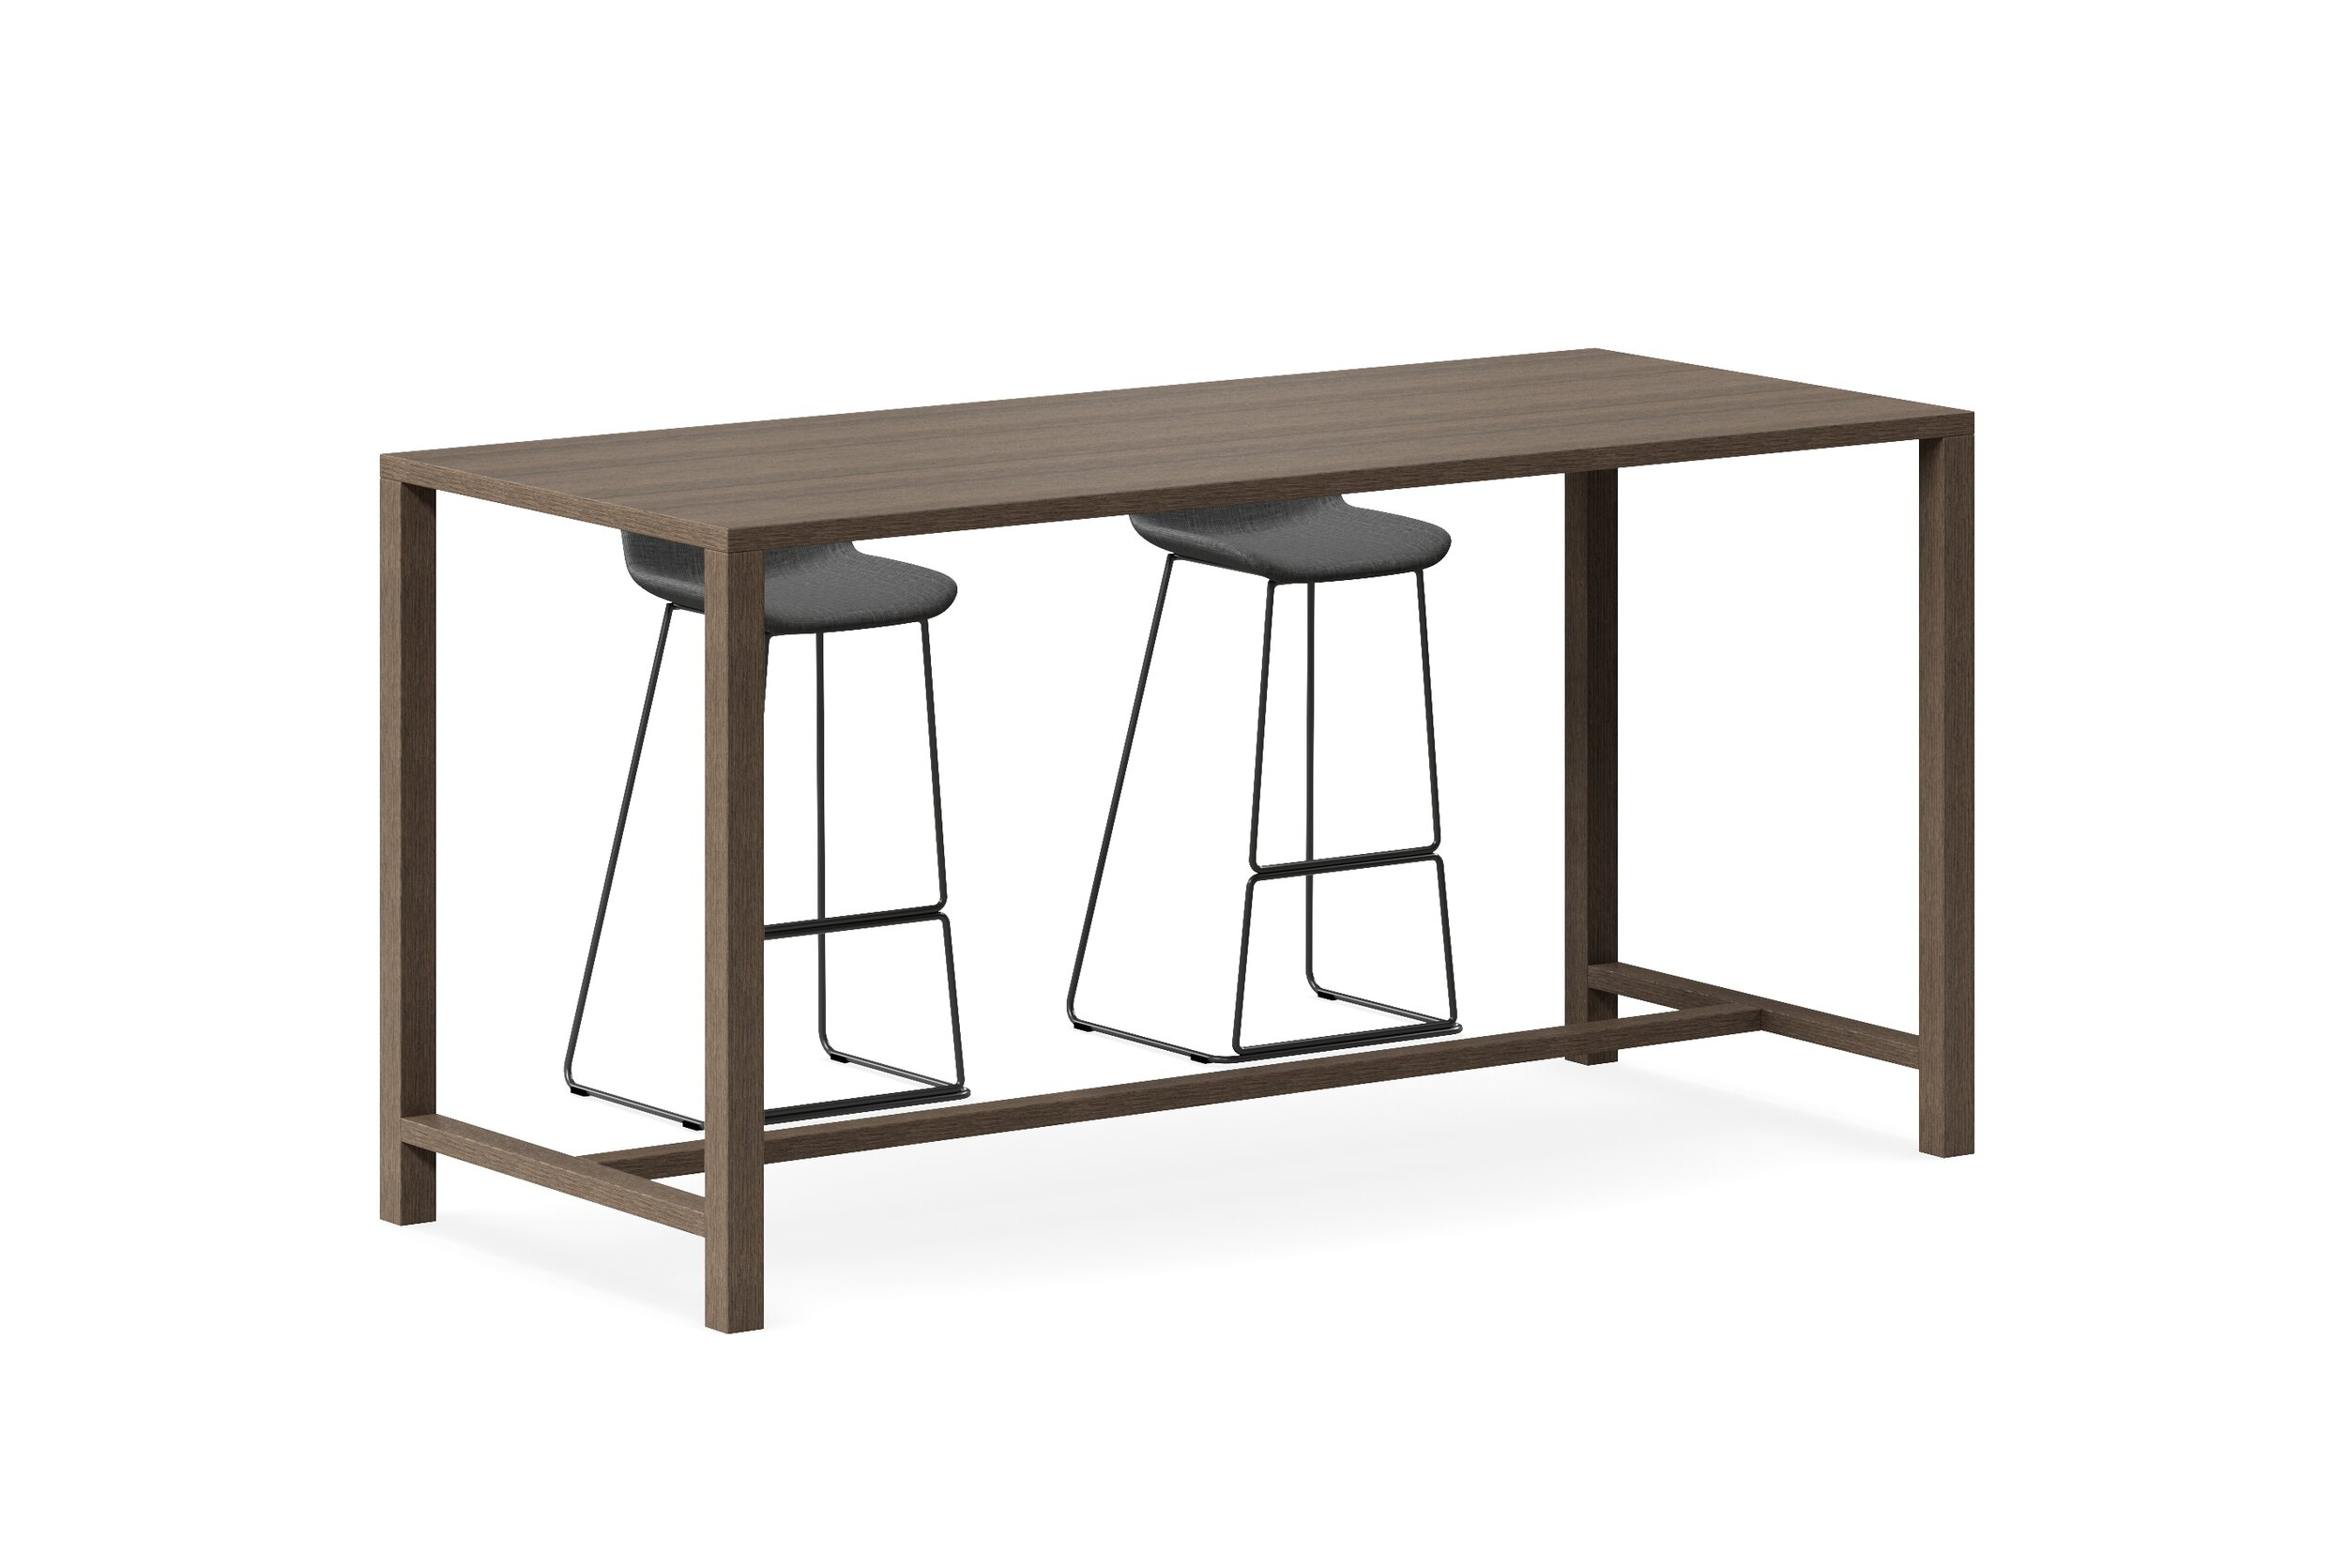 tilda_counter_table_1050h_zorro_01.jpg.